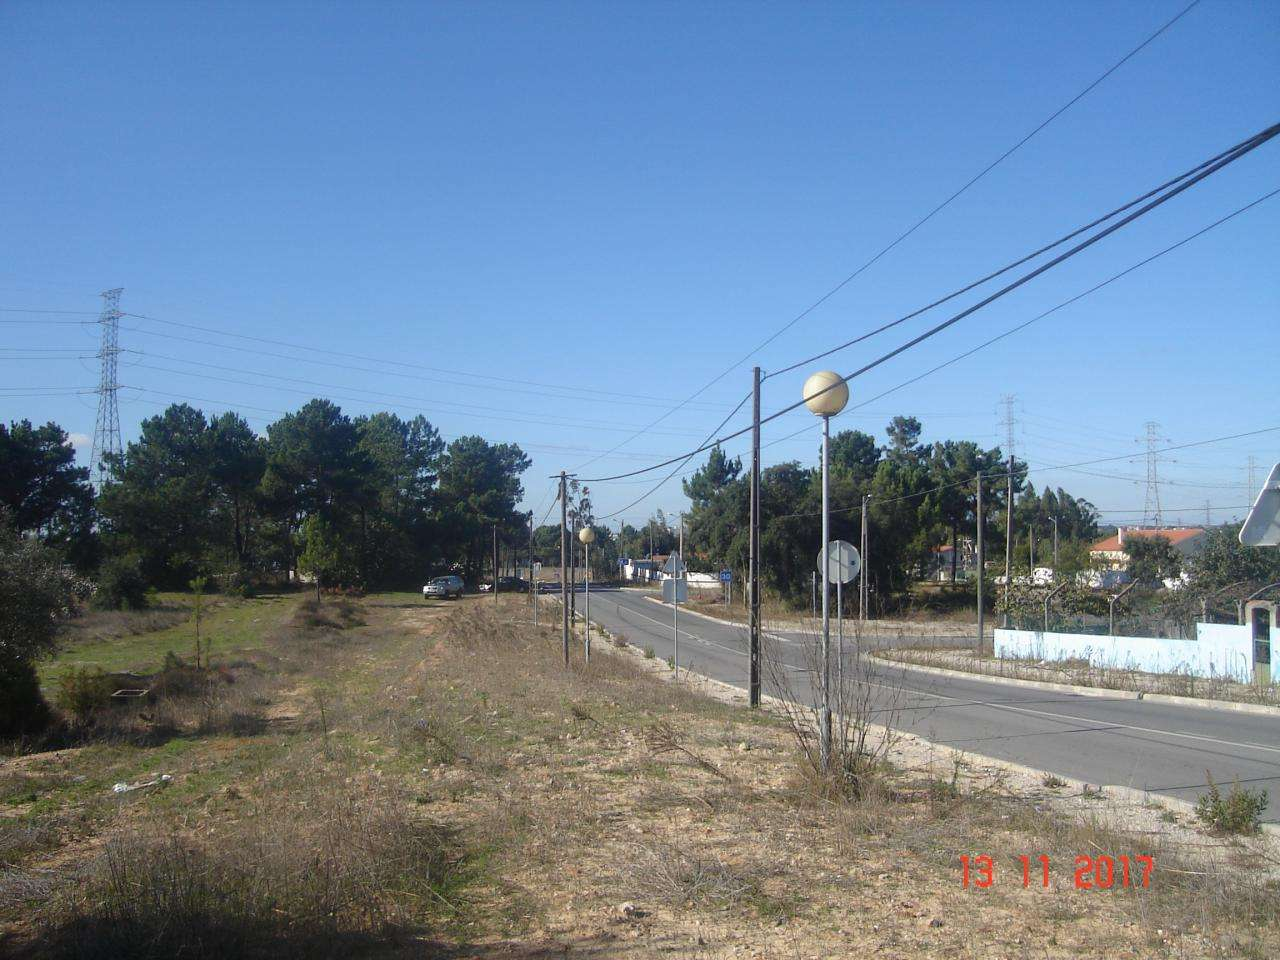 Terreno para comprar, Quinta do Anjo, Palmela, Setúbal - Foto 1